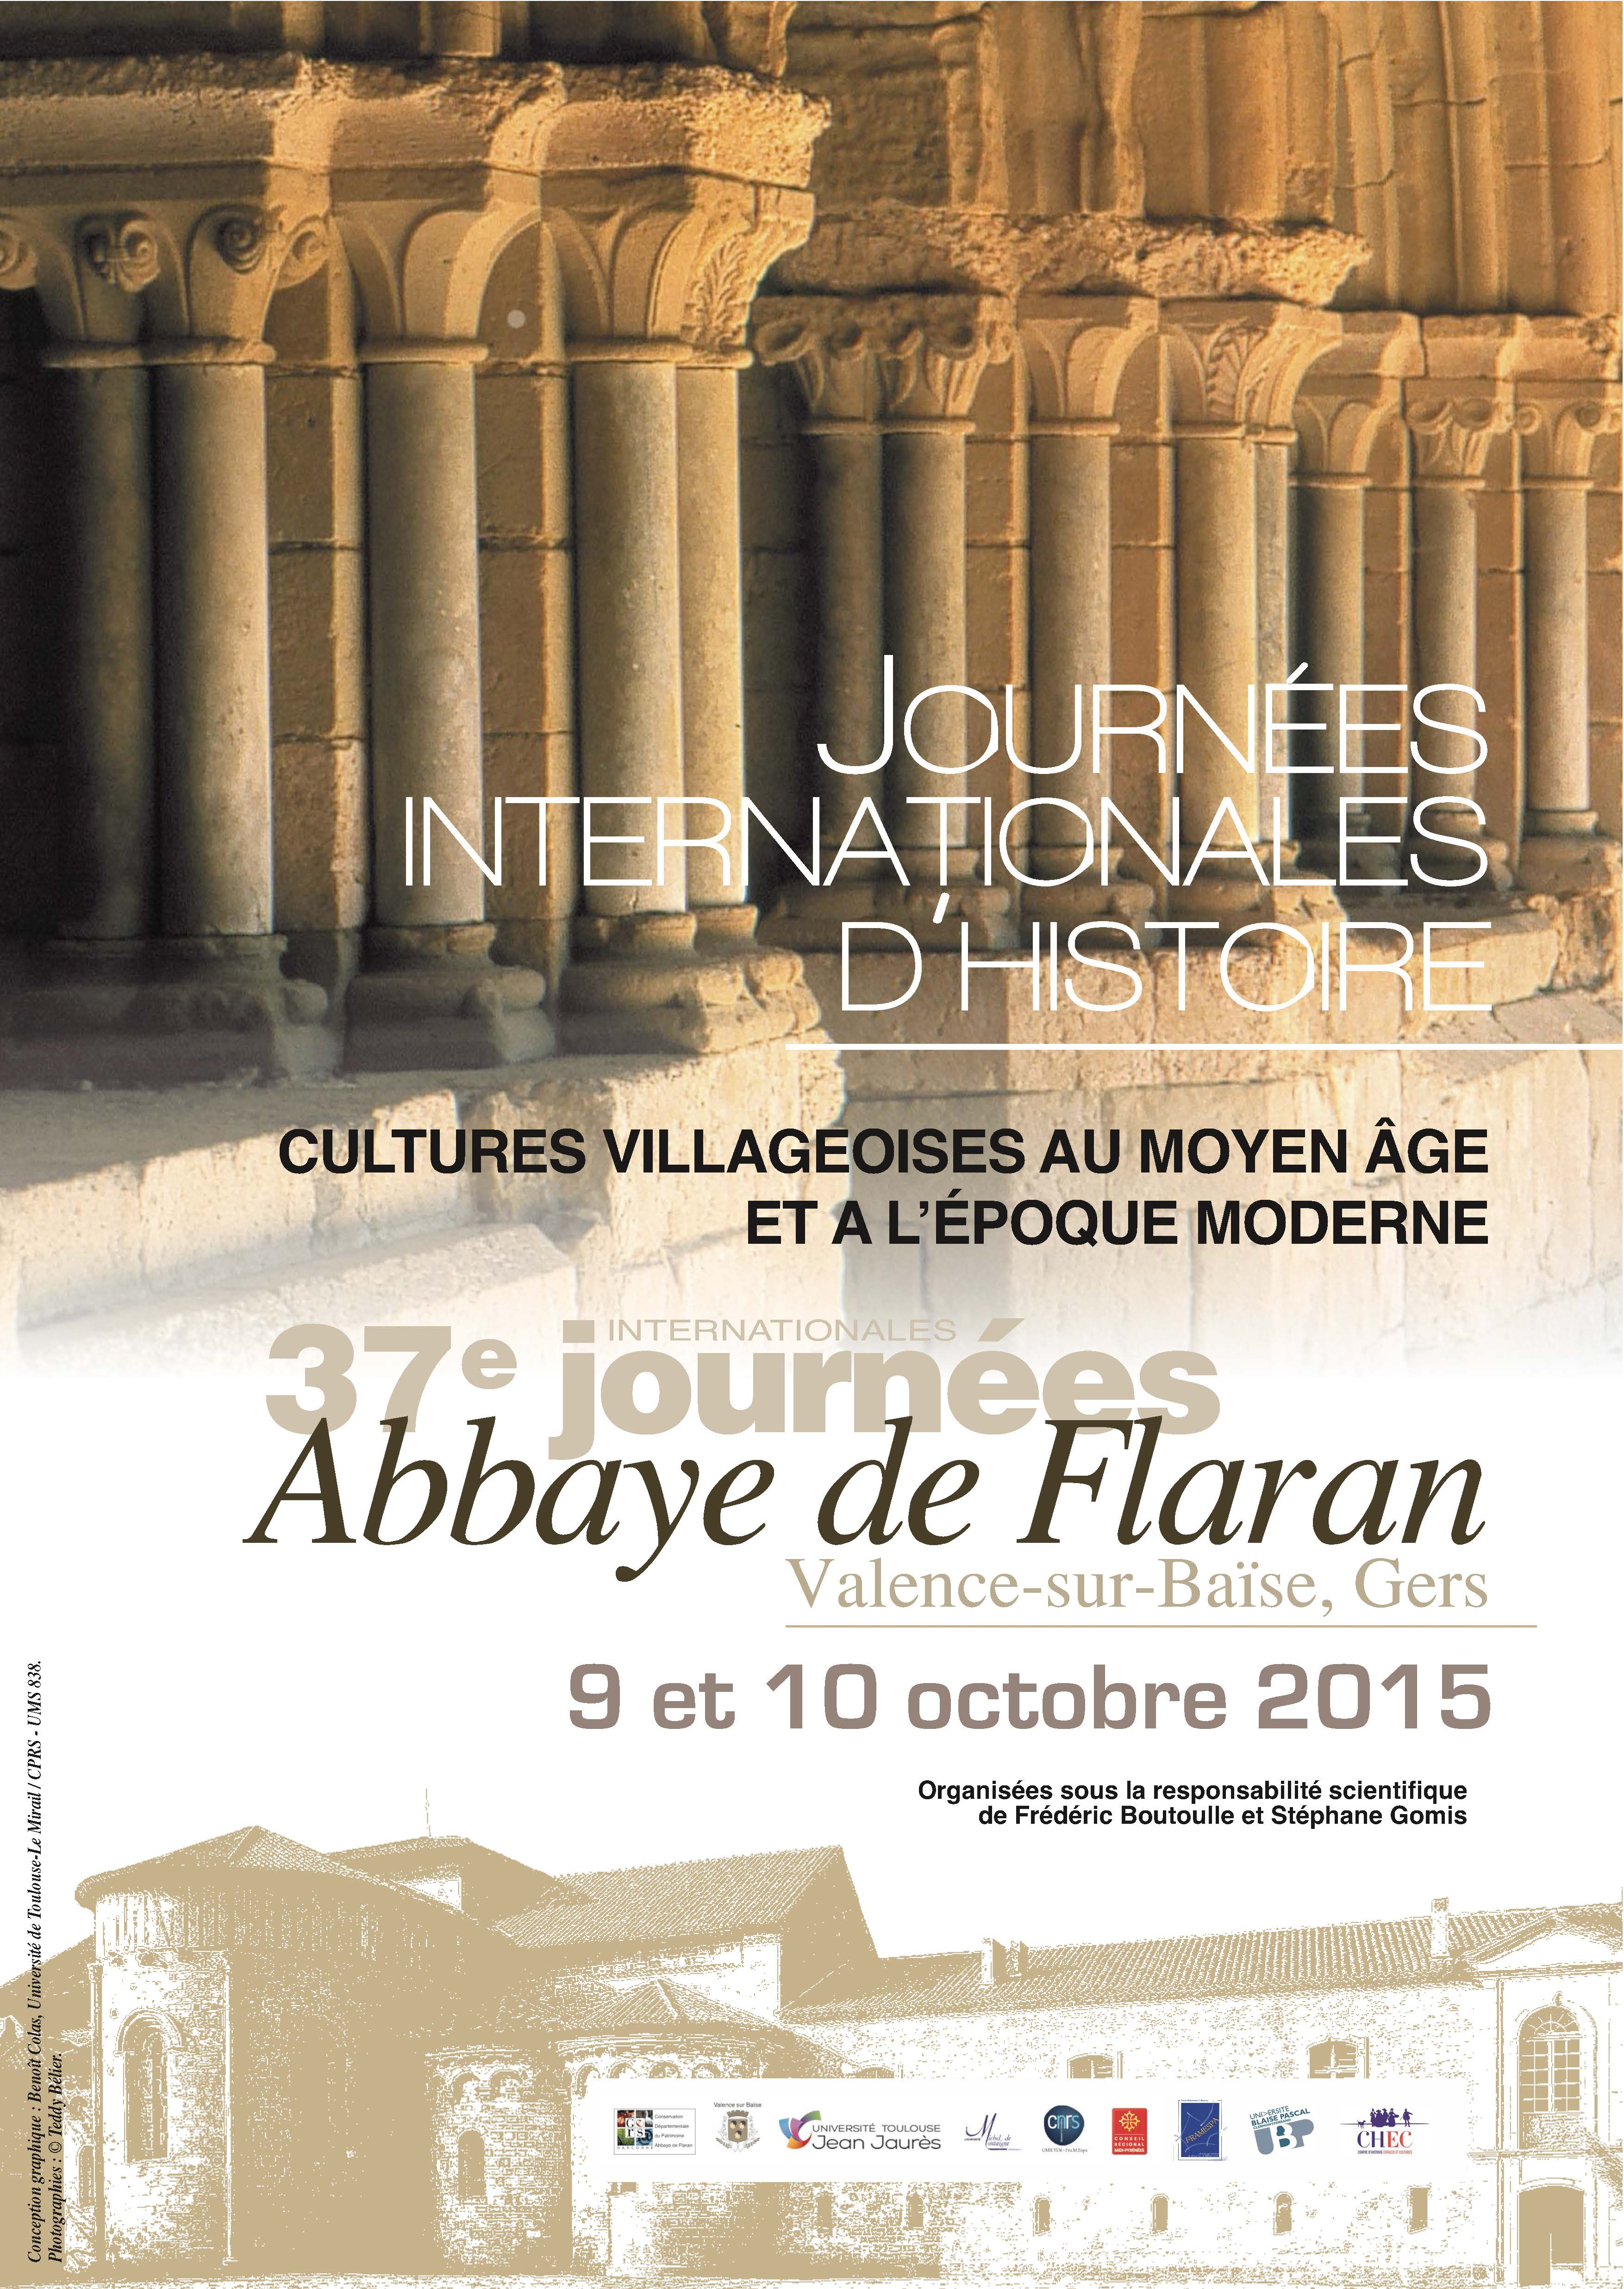 A3FLARAN 2015.jpg